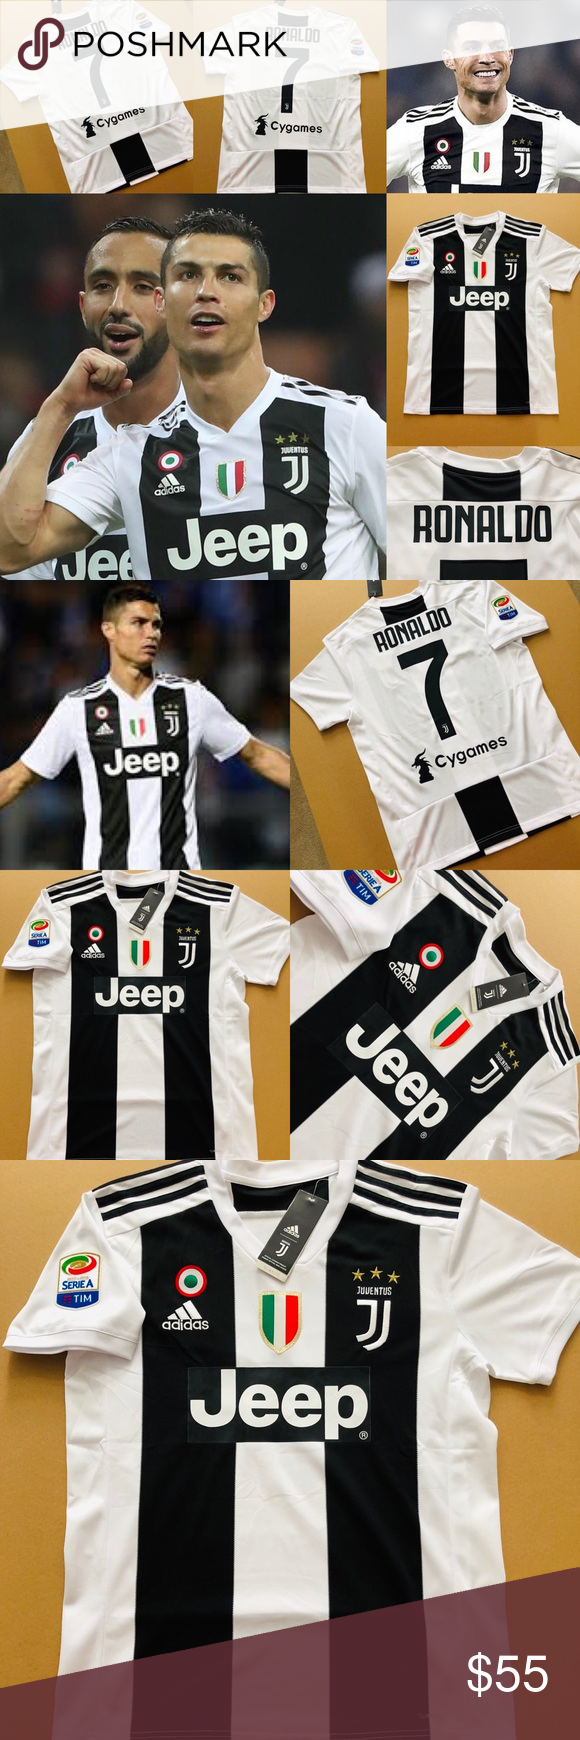 f3f26d75d0e 2019 Ronaldo  7 Juventus Home Soccer Jersey CR7 2019 Juventus F.C. Cristiano  Ronaldo  7 Adidas Classic Juventus Jersey Brand New ~ SMALL ~ Men s Soccer  ...